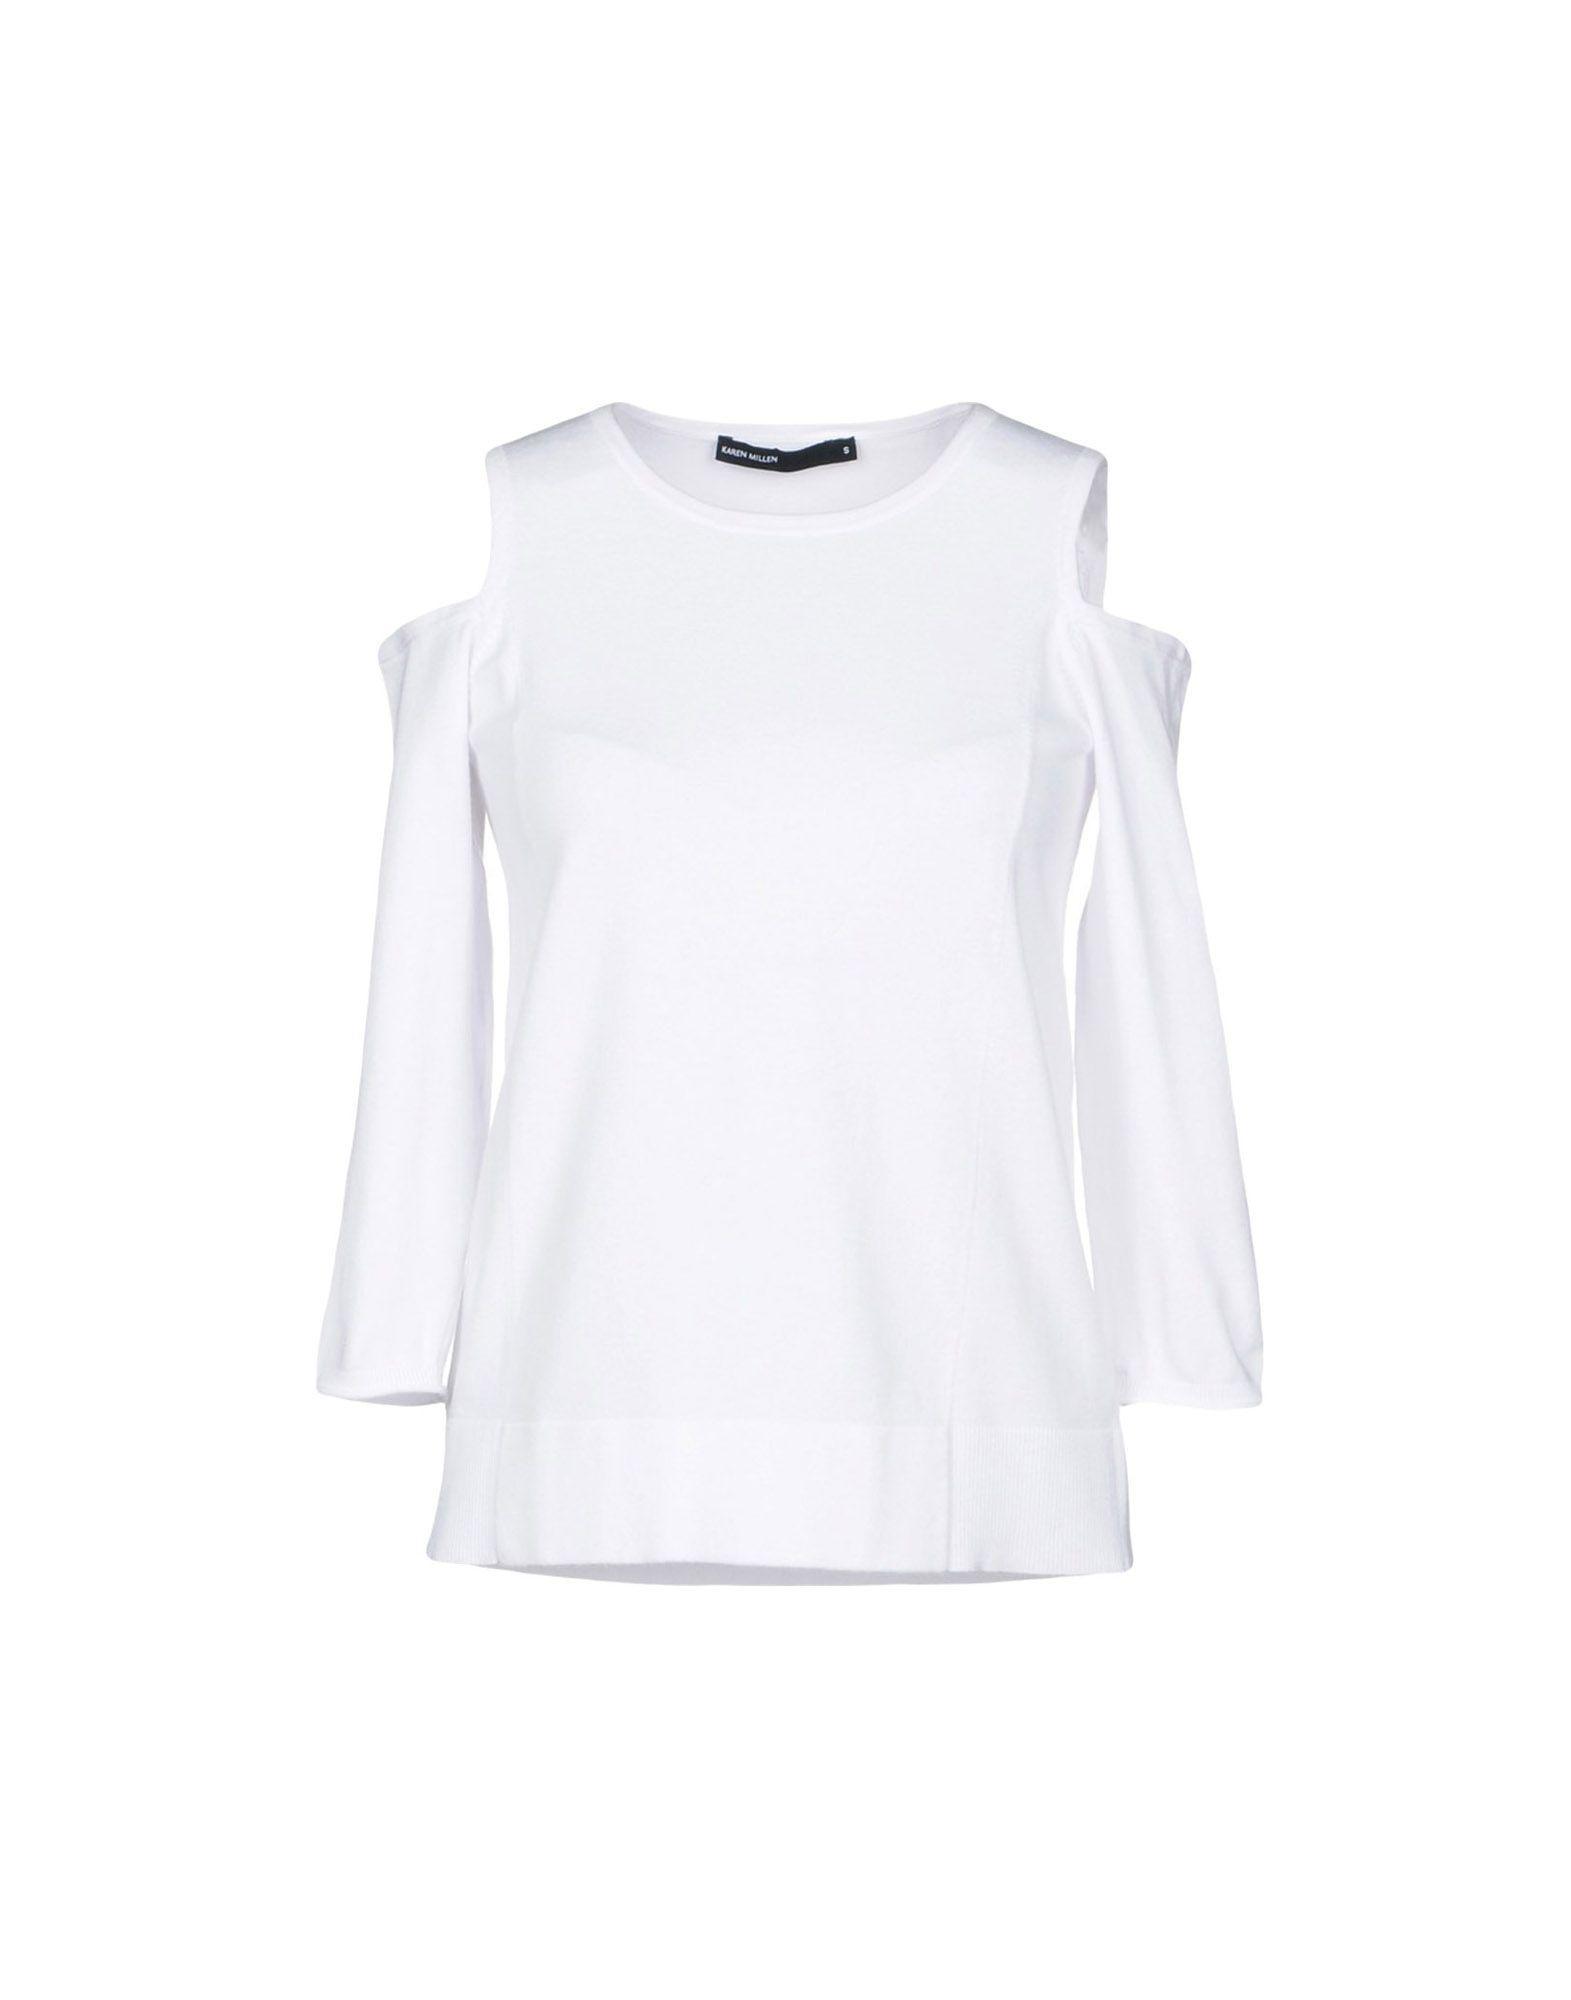 Karen Millen Sweater In White